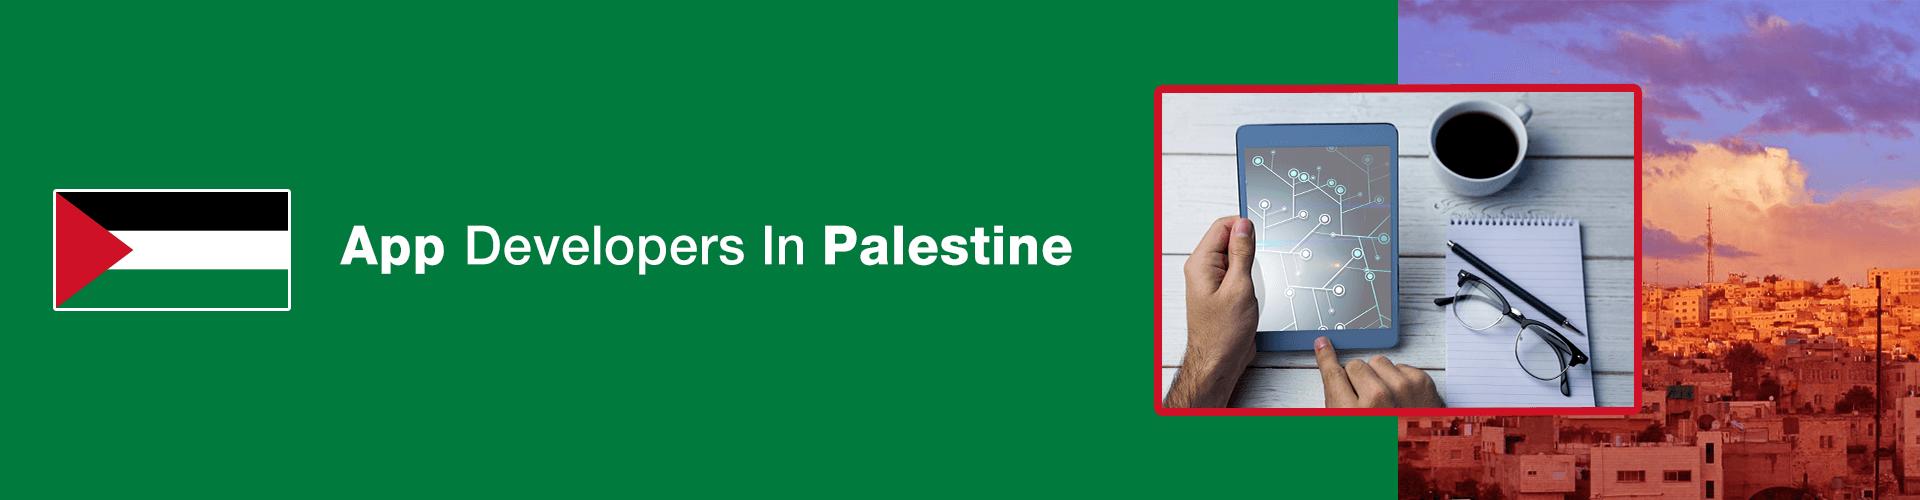 app developers palestine